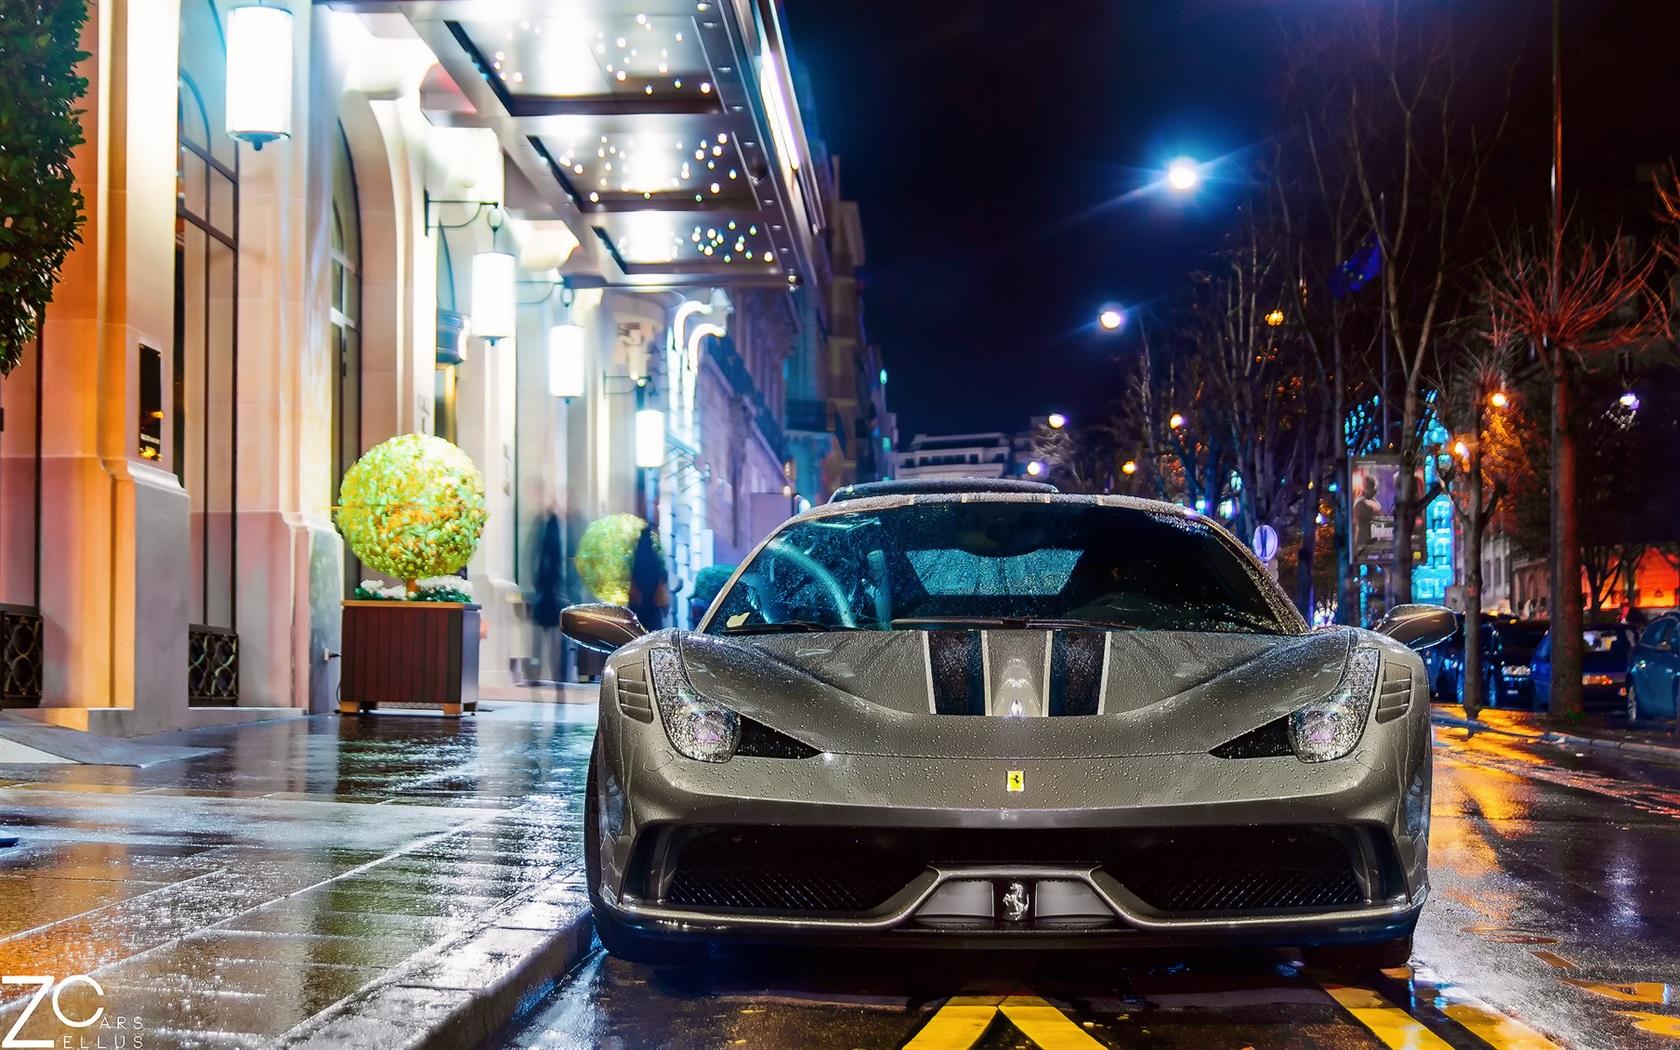 Must see Wallpaper Night Ferrari - Ferrari-458-Speciale-supercar-at-night-street-Paris-France_1680x1050  Pictures-279777.jpg